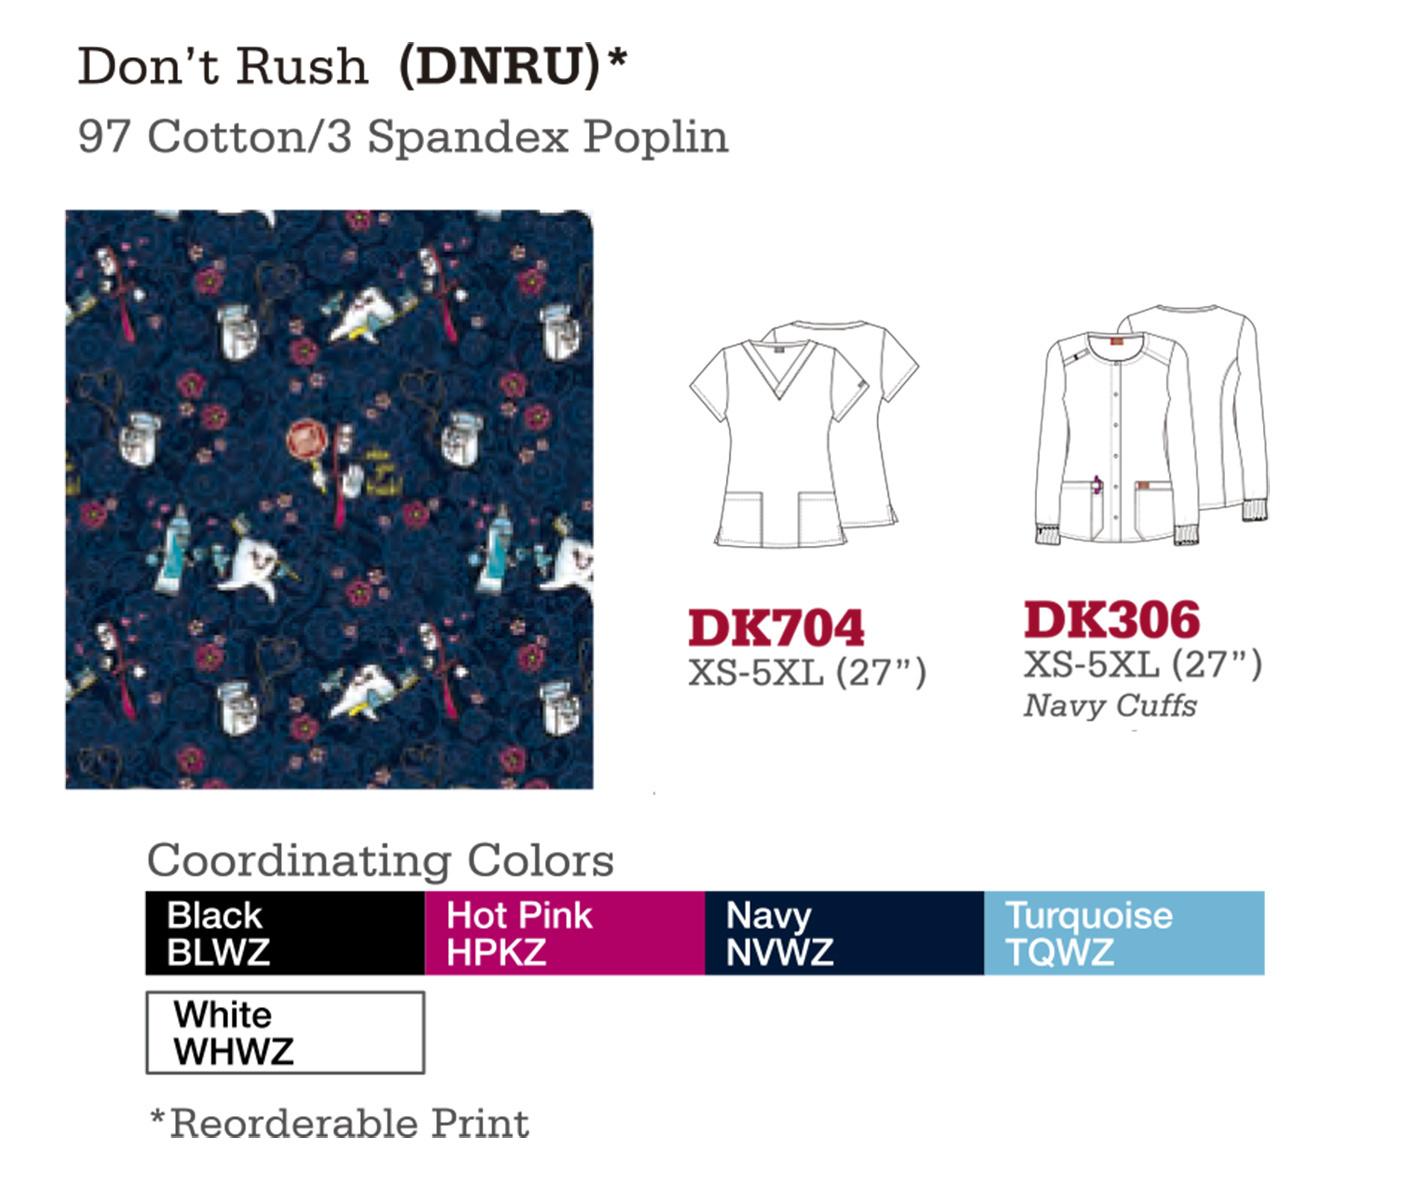 Don't Rush. DK704. DK306.